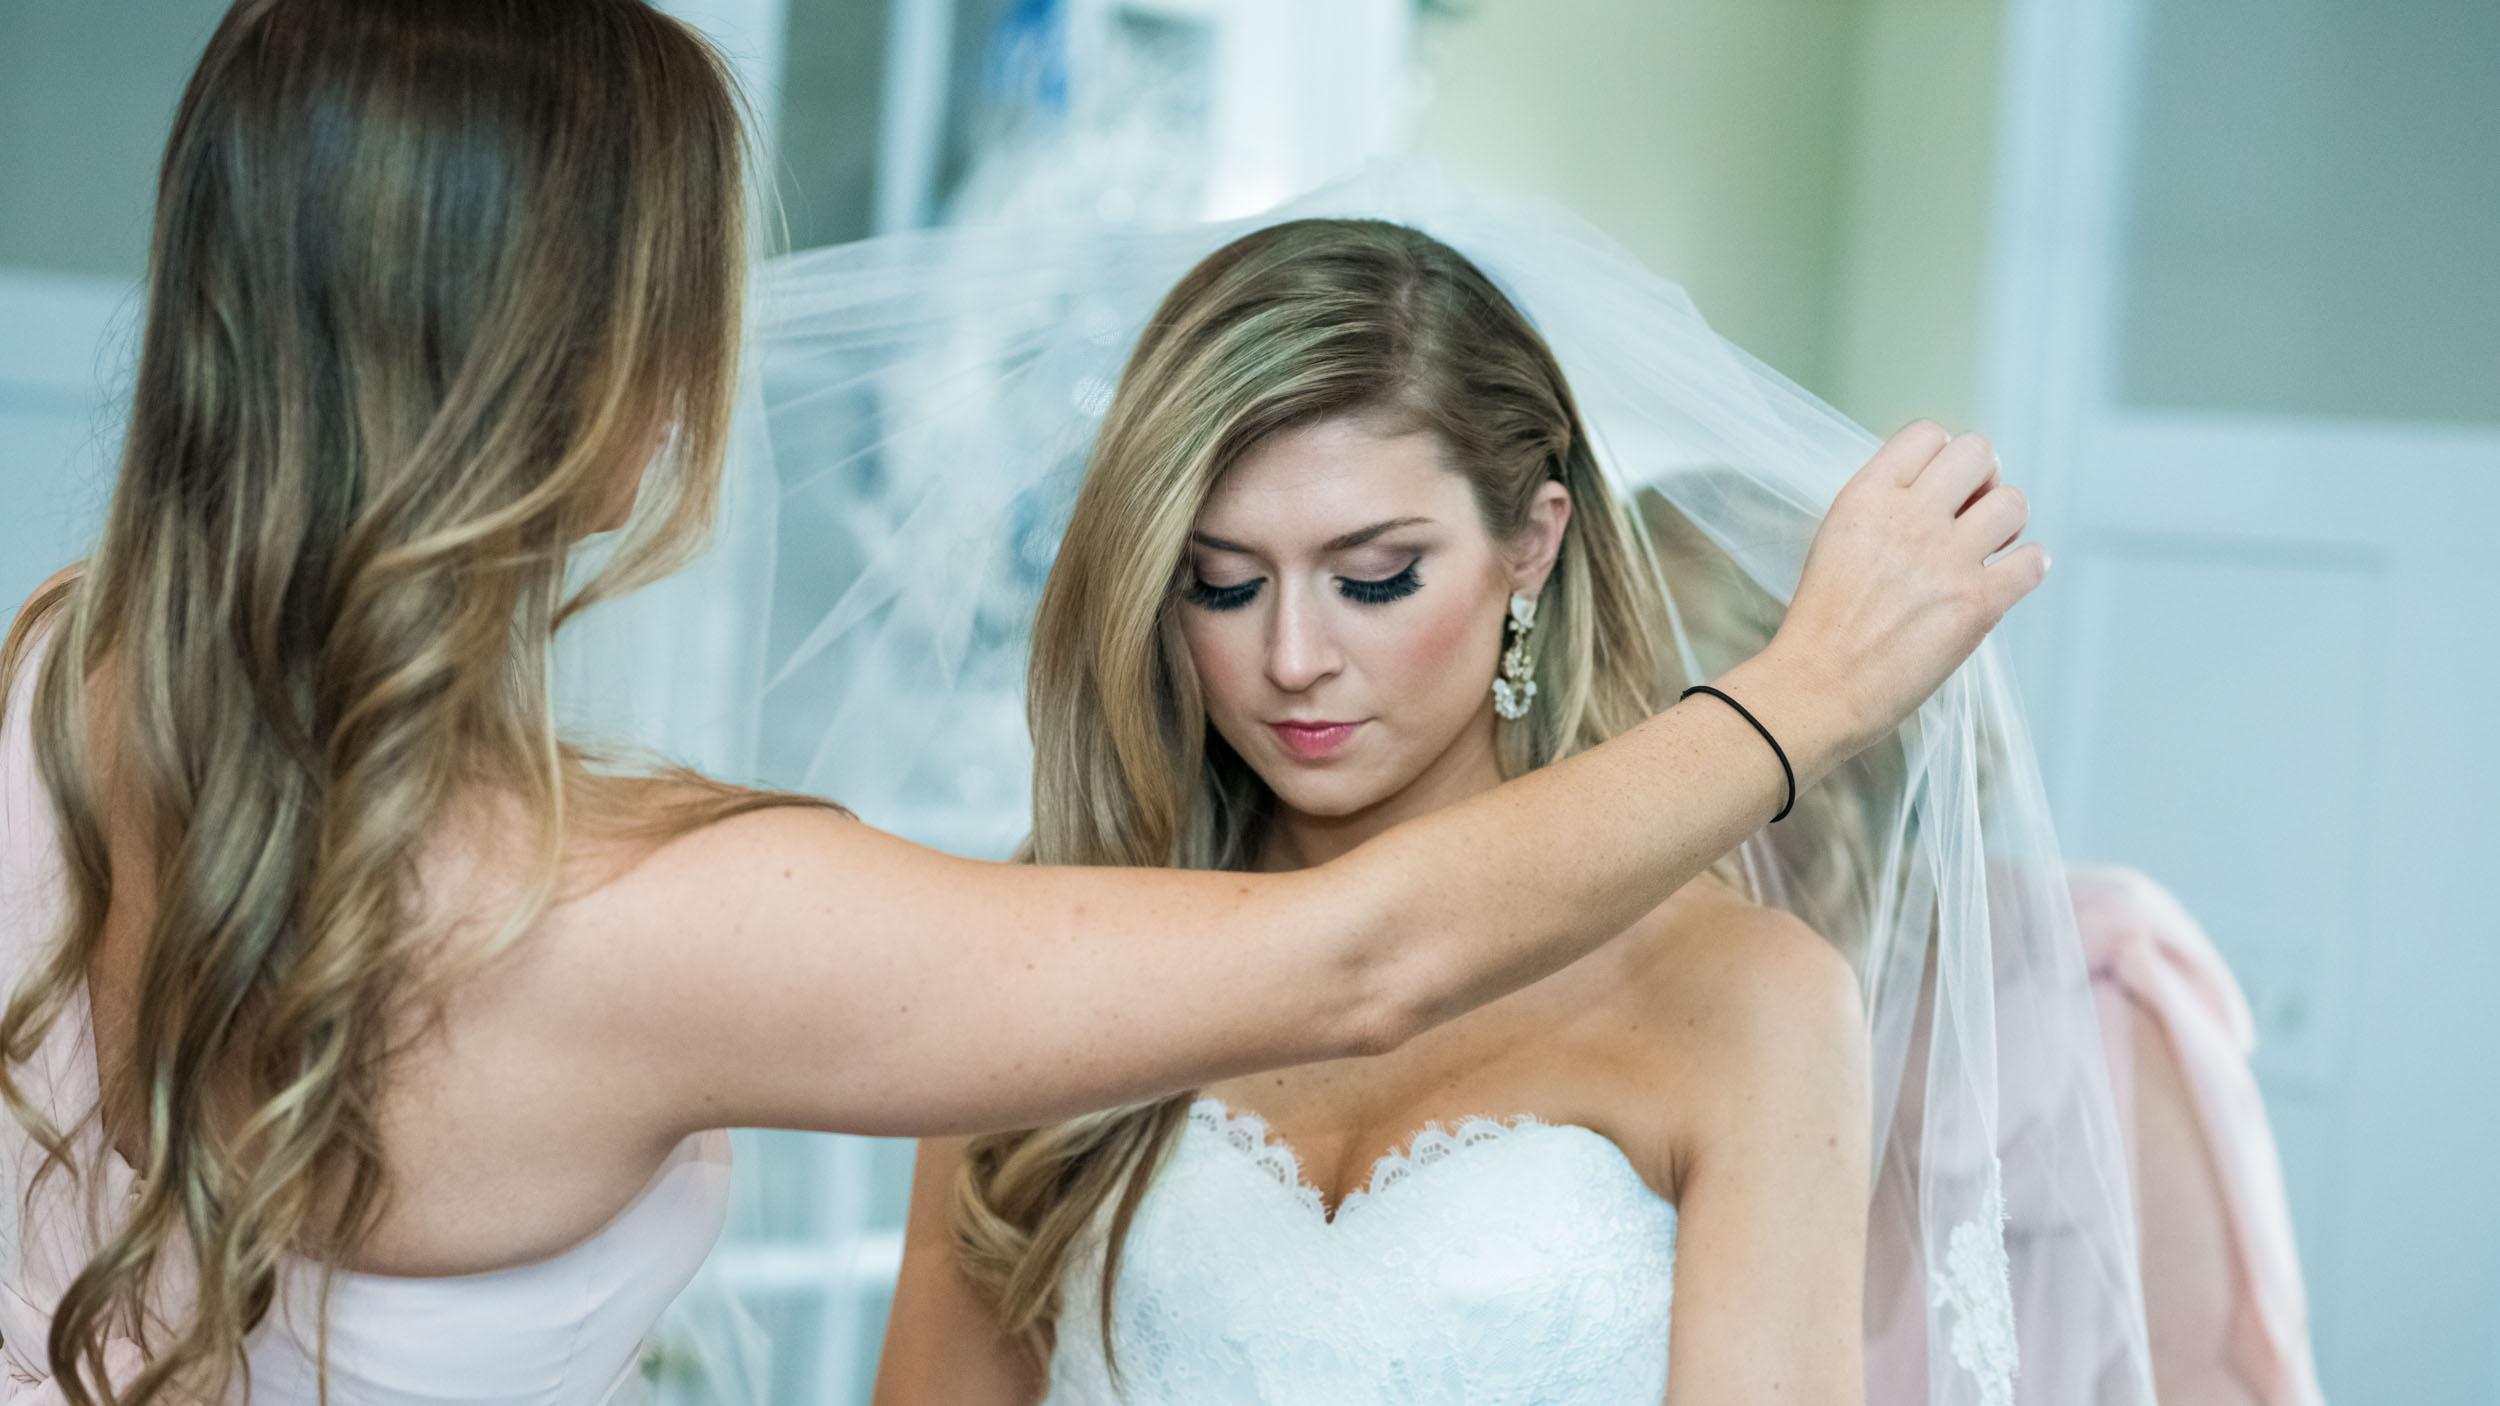 dc+metro+wedding+photographer+vadym+guliuk+photography+weddings-2020.jpg